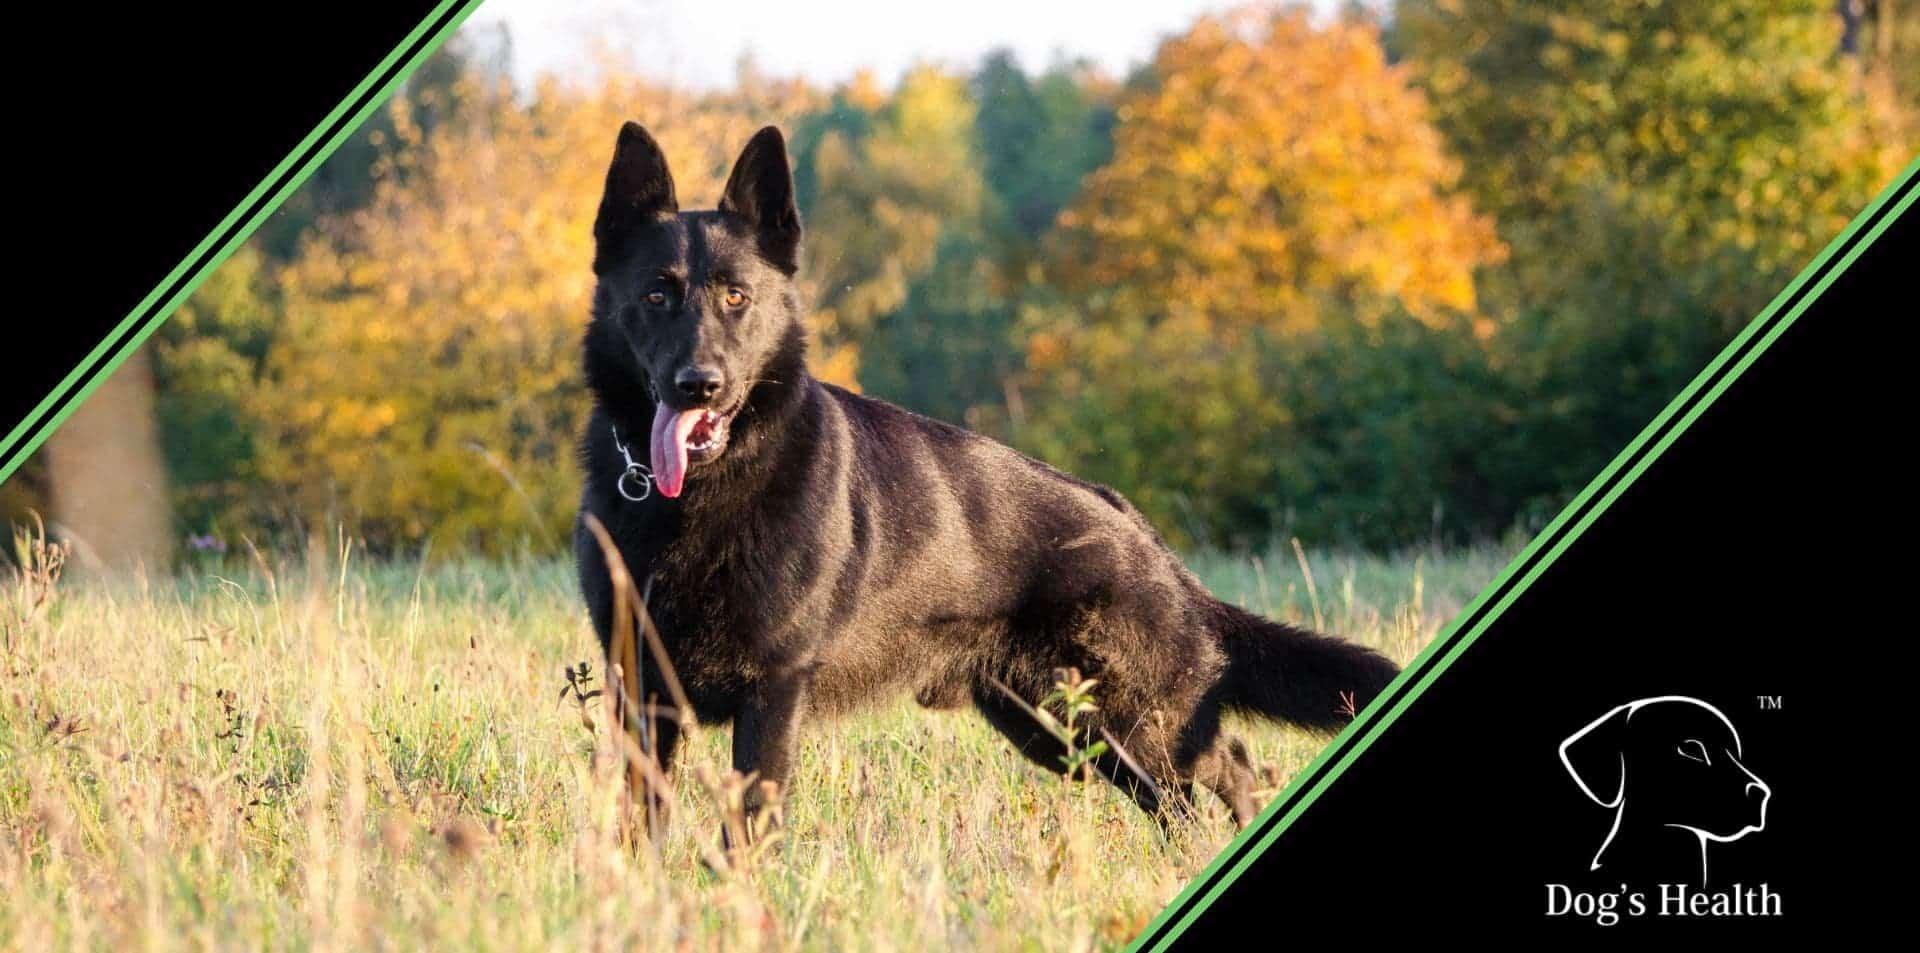 forasacco cane naso orecchie sintomi